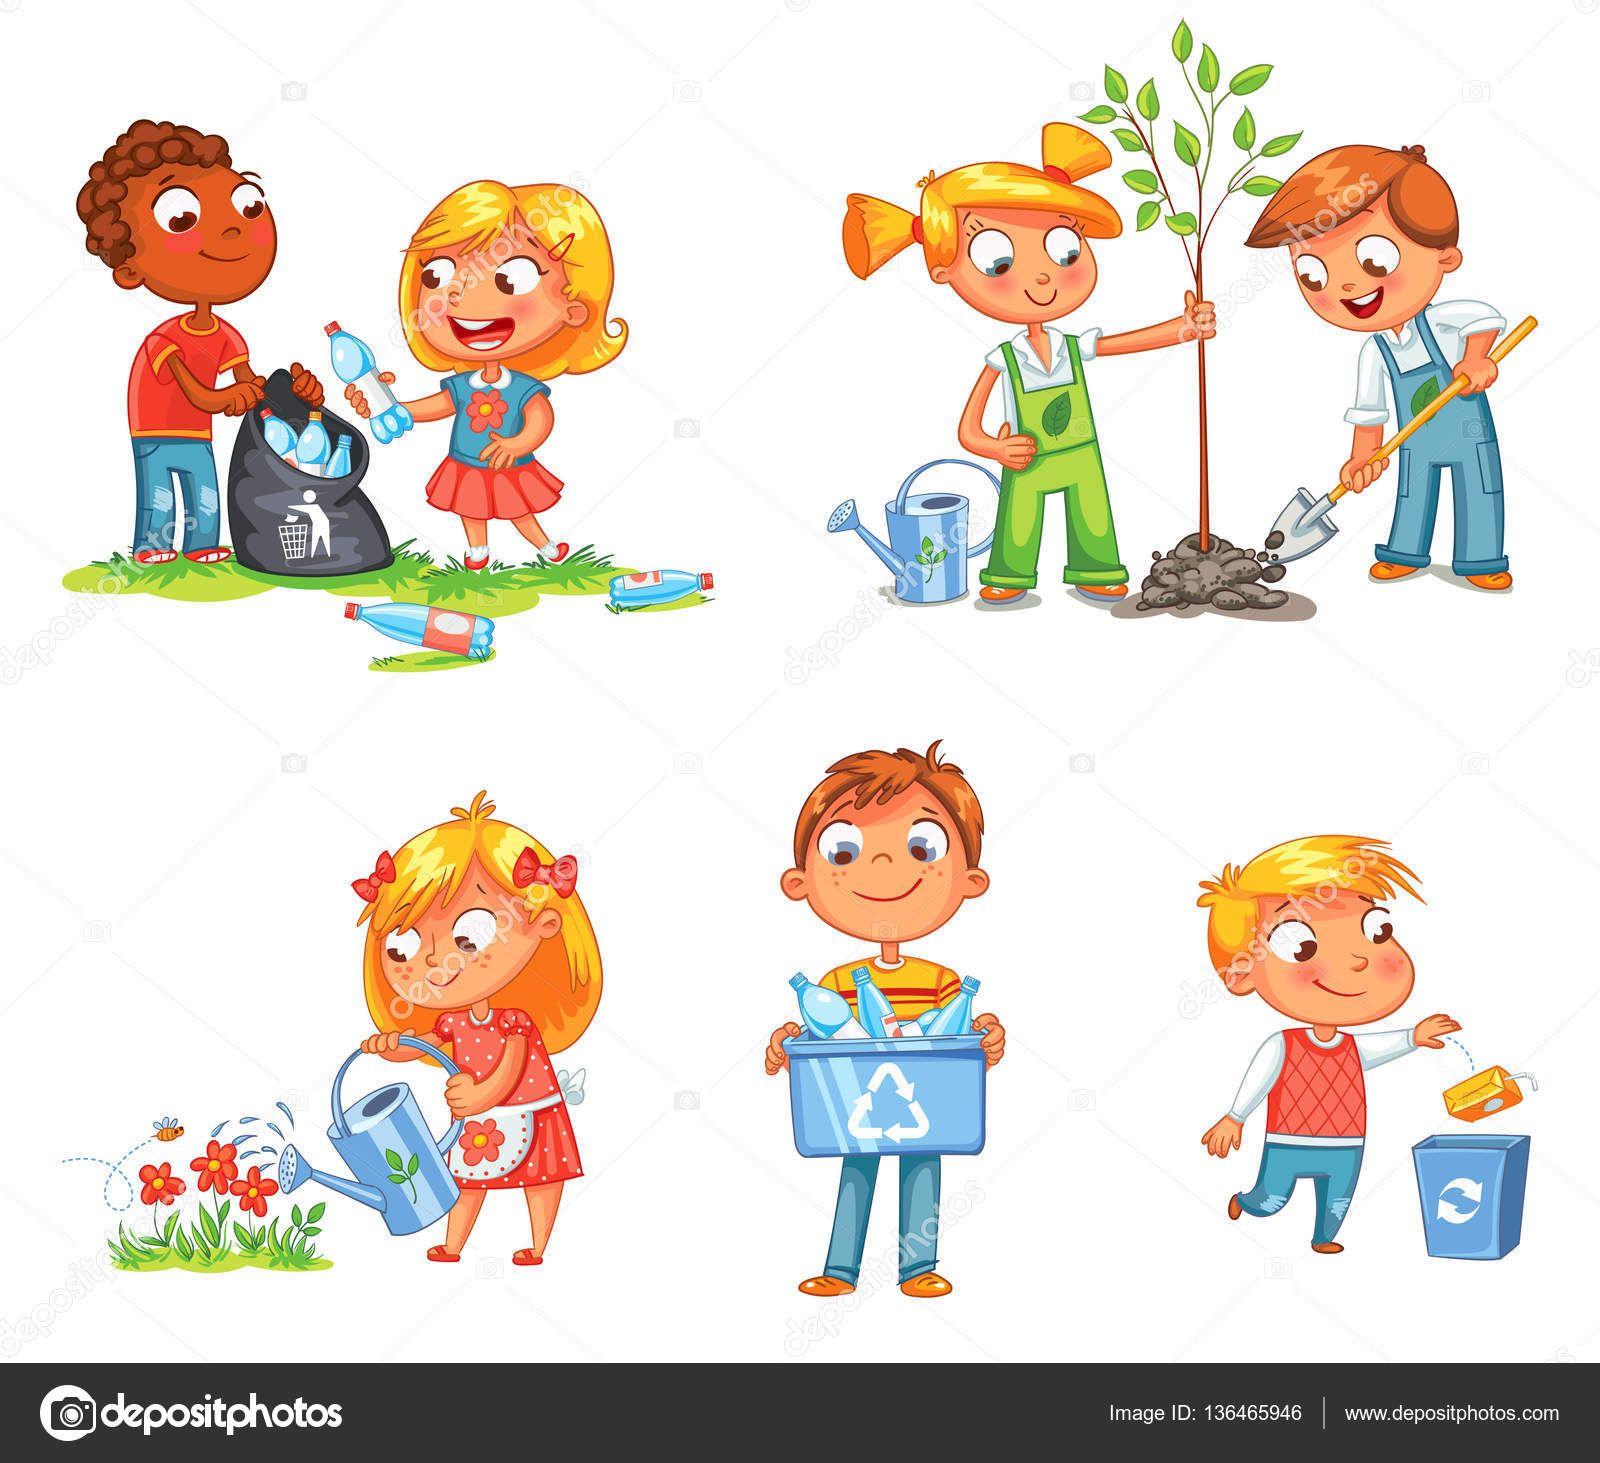 Pin By Briseida Alca On Den Na Zemyata Funny Cartoon Characters Cartoon Character Design Character Design Animation